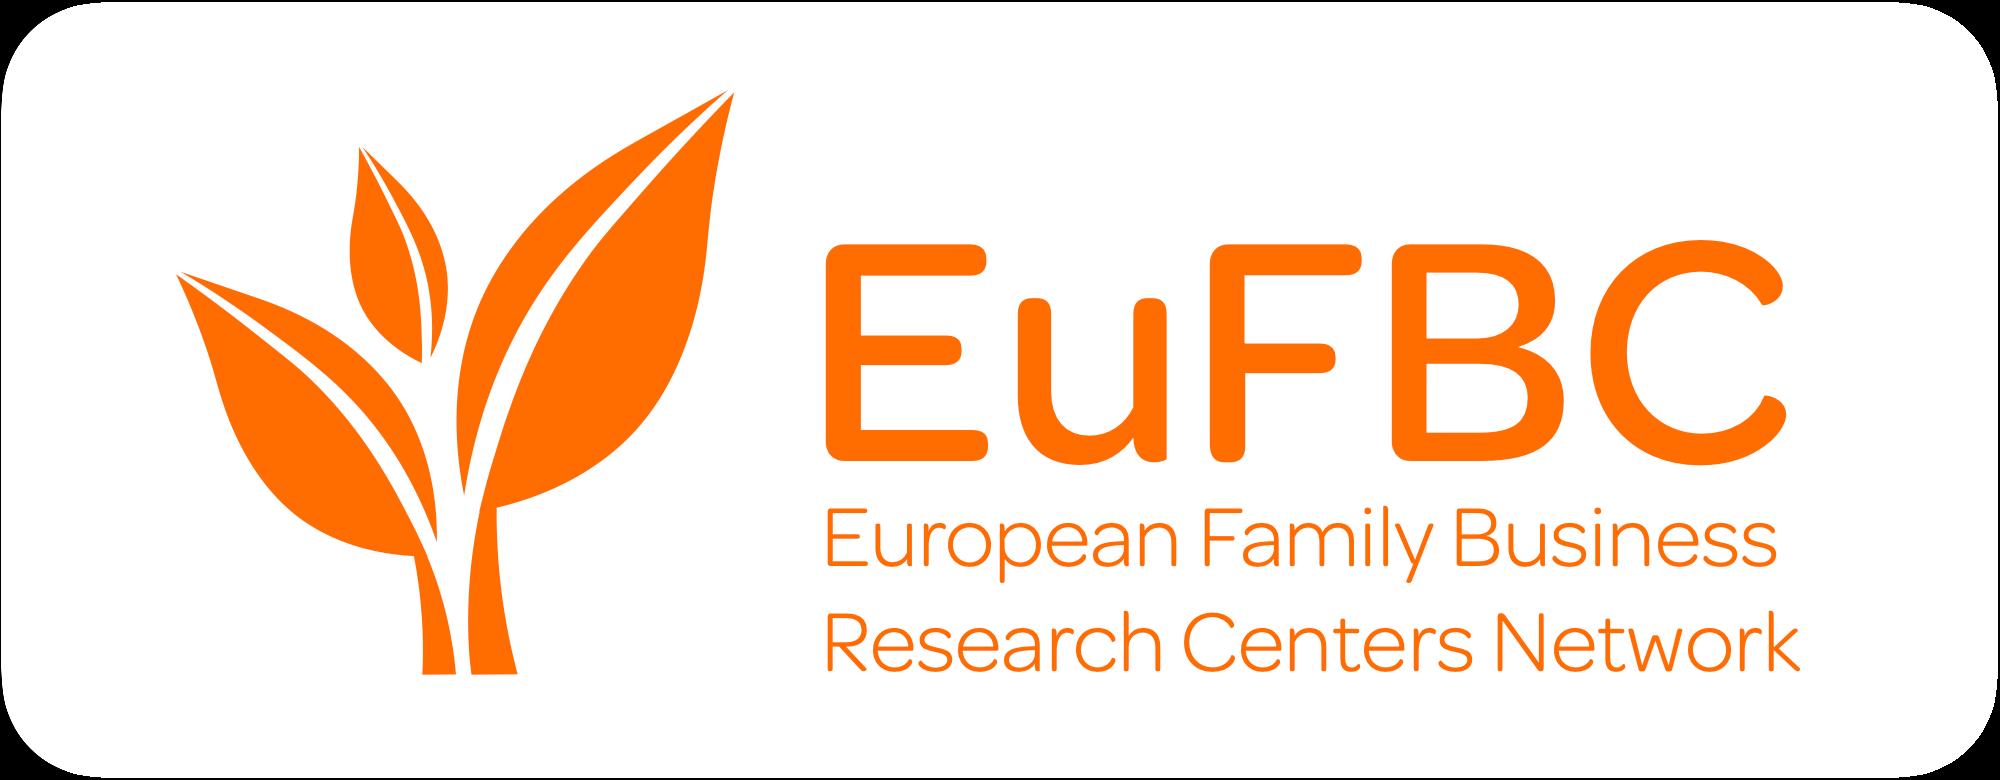 EuFBC